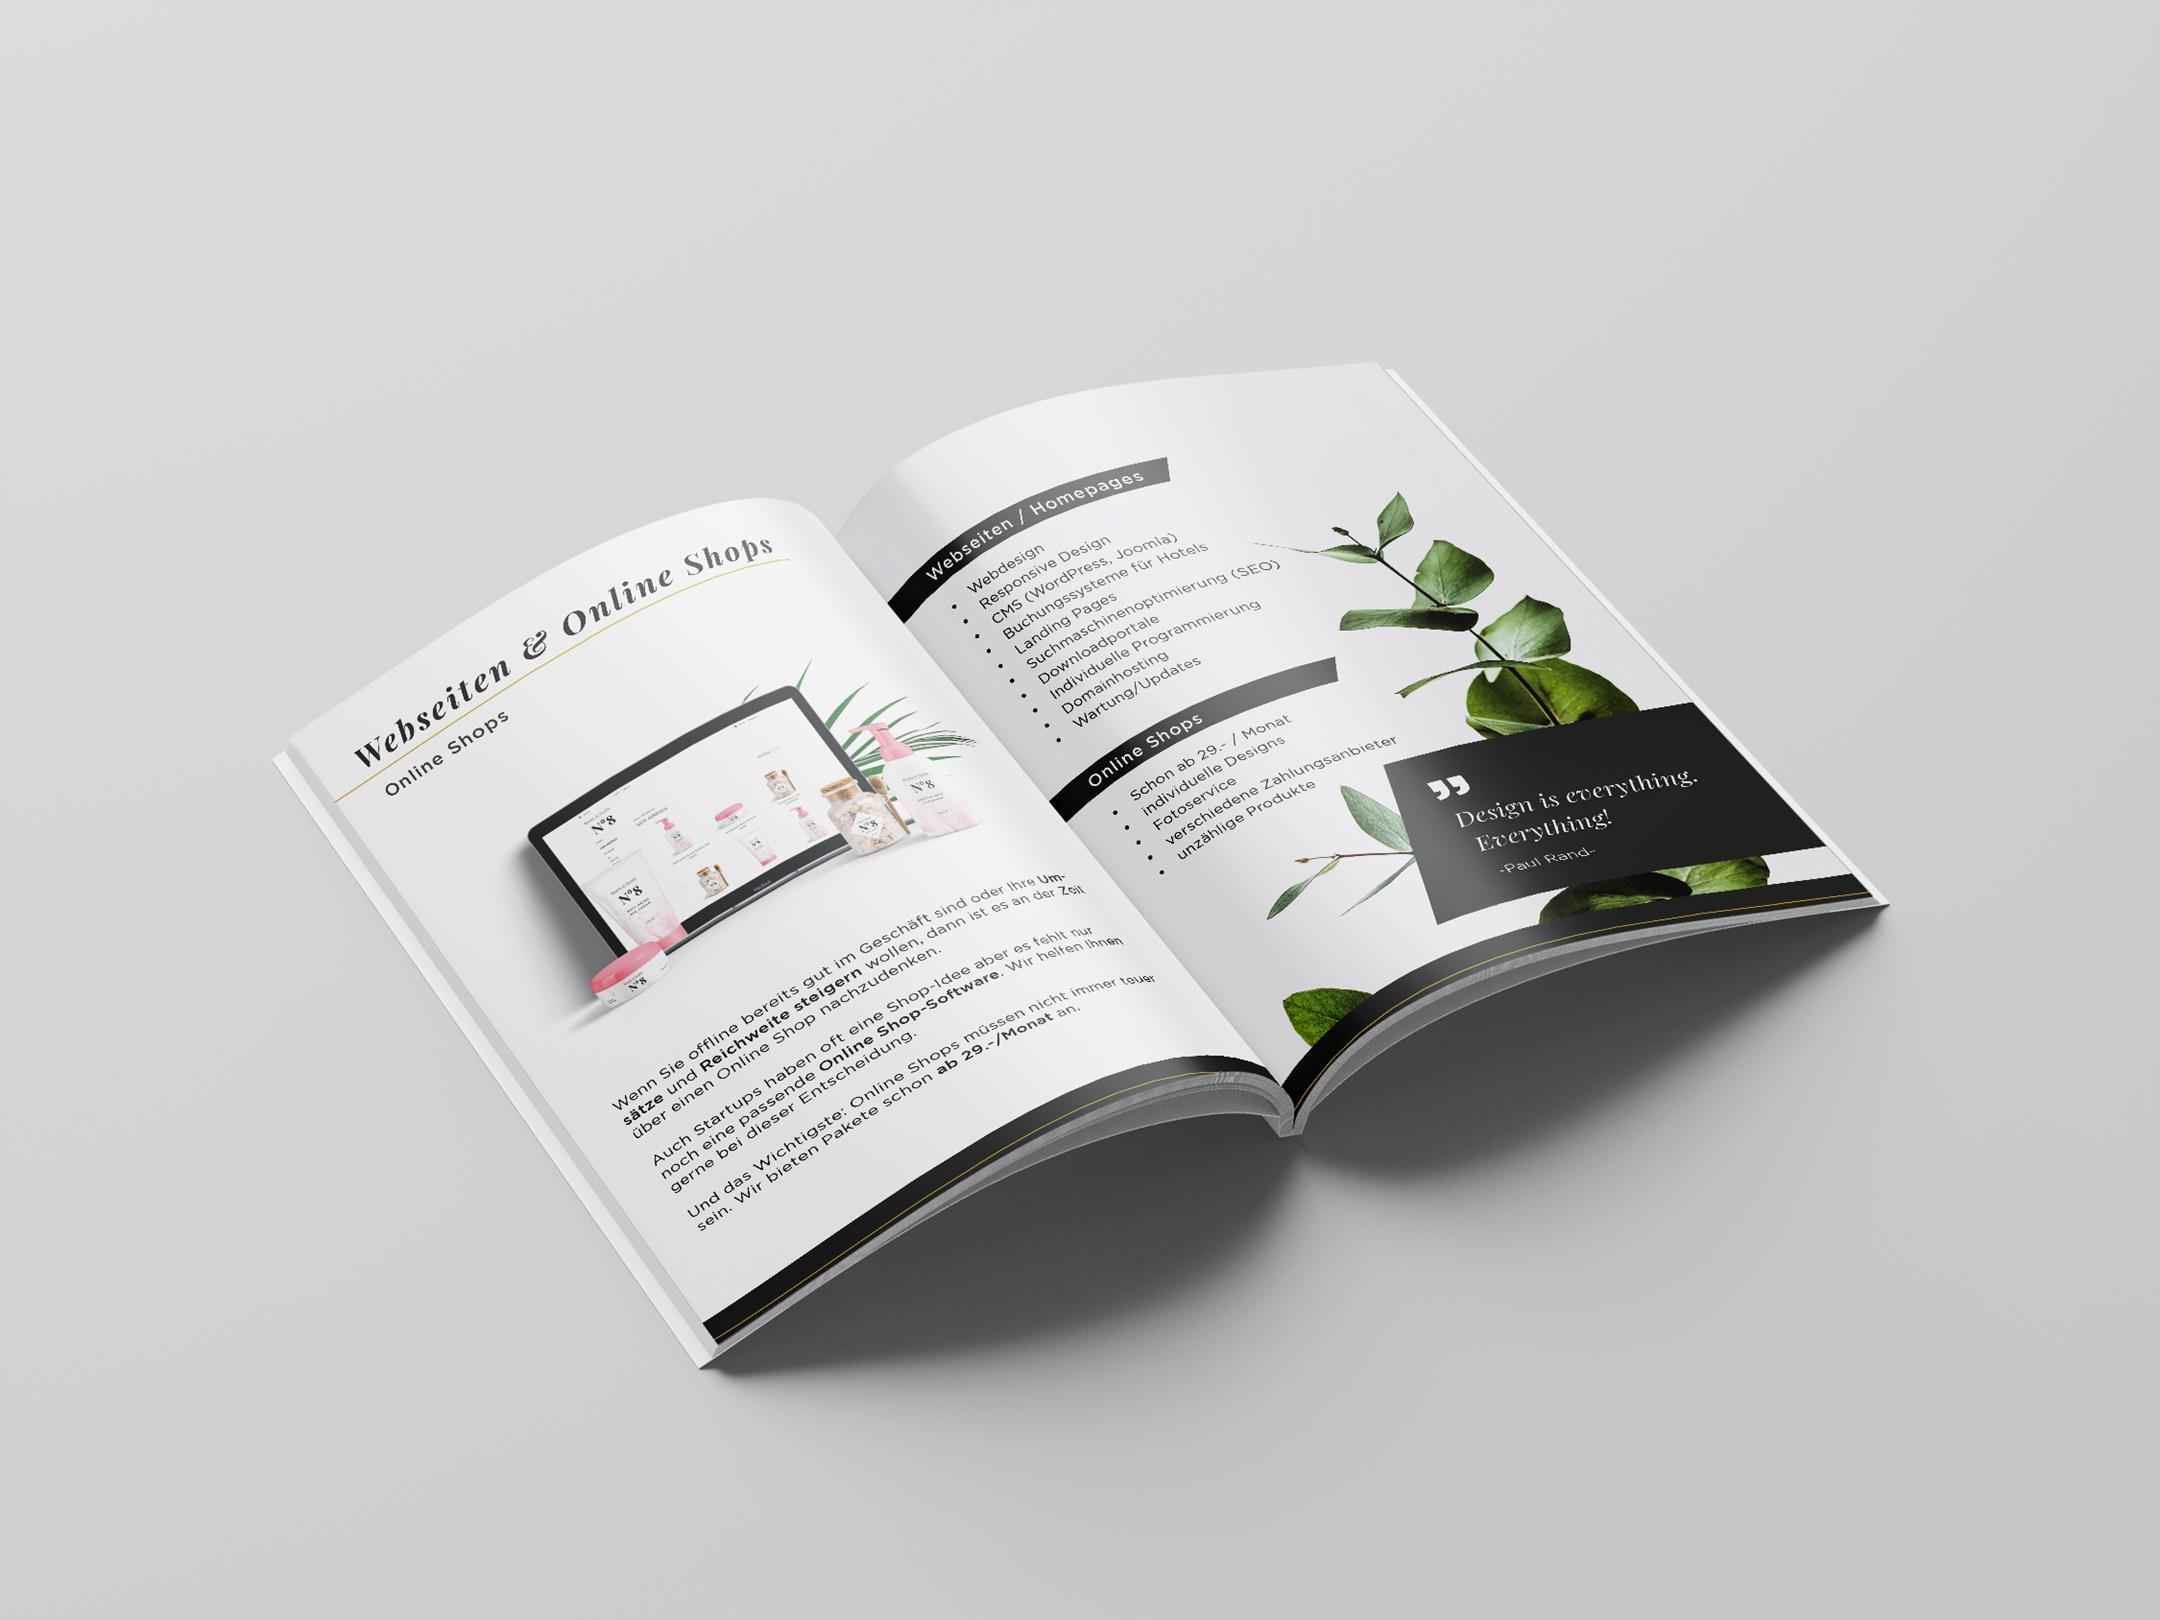 -bk-perfection-broschüre-mockup-42160×1620